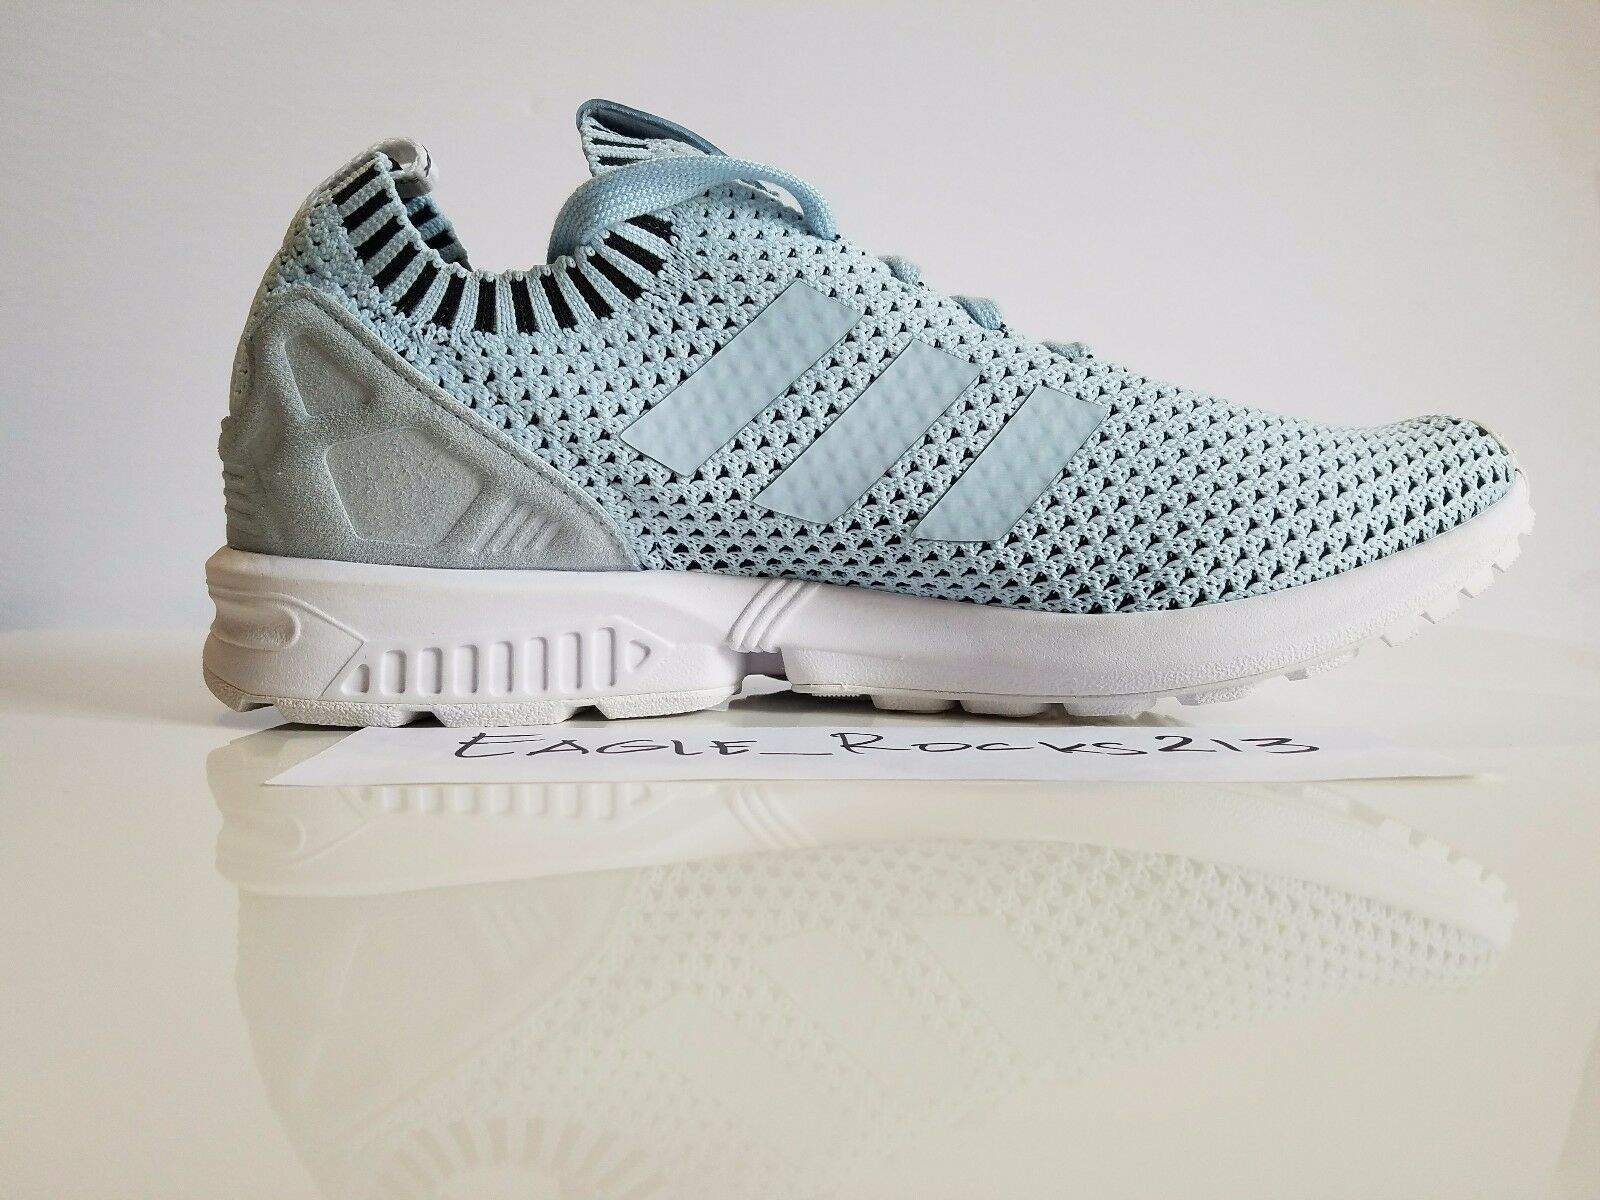 Adidas ORIGINALS MEN'S ZX FLUX PK Primeknit Sneakers Ice Blue S75973 Sz 11.5 NEW